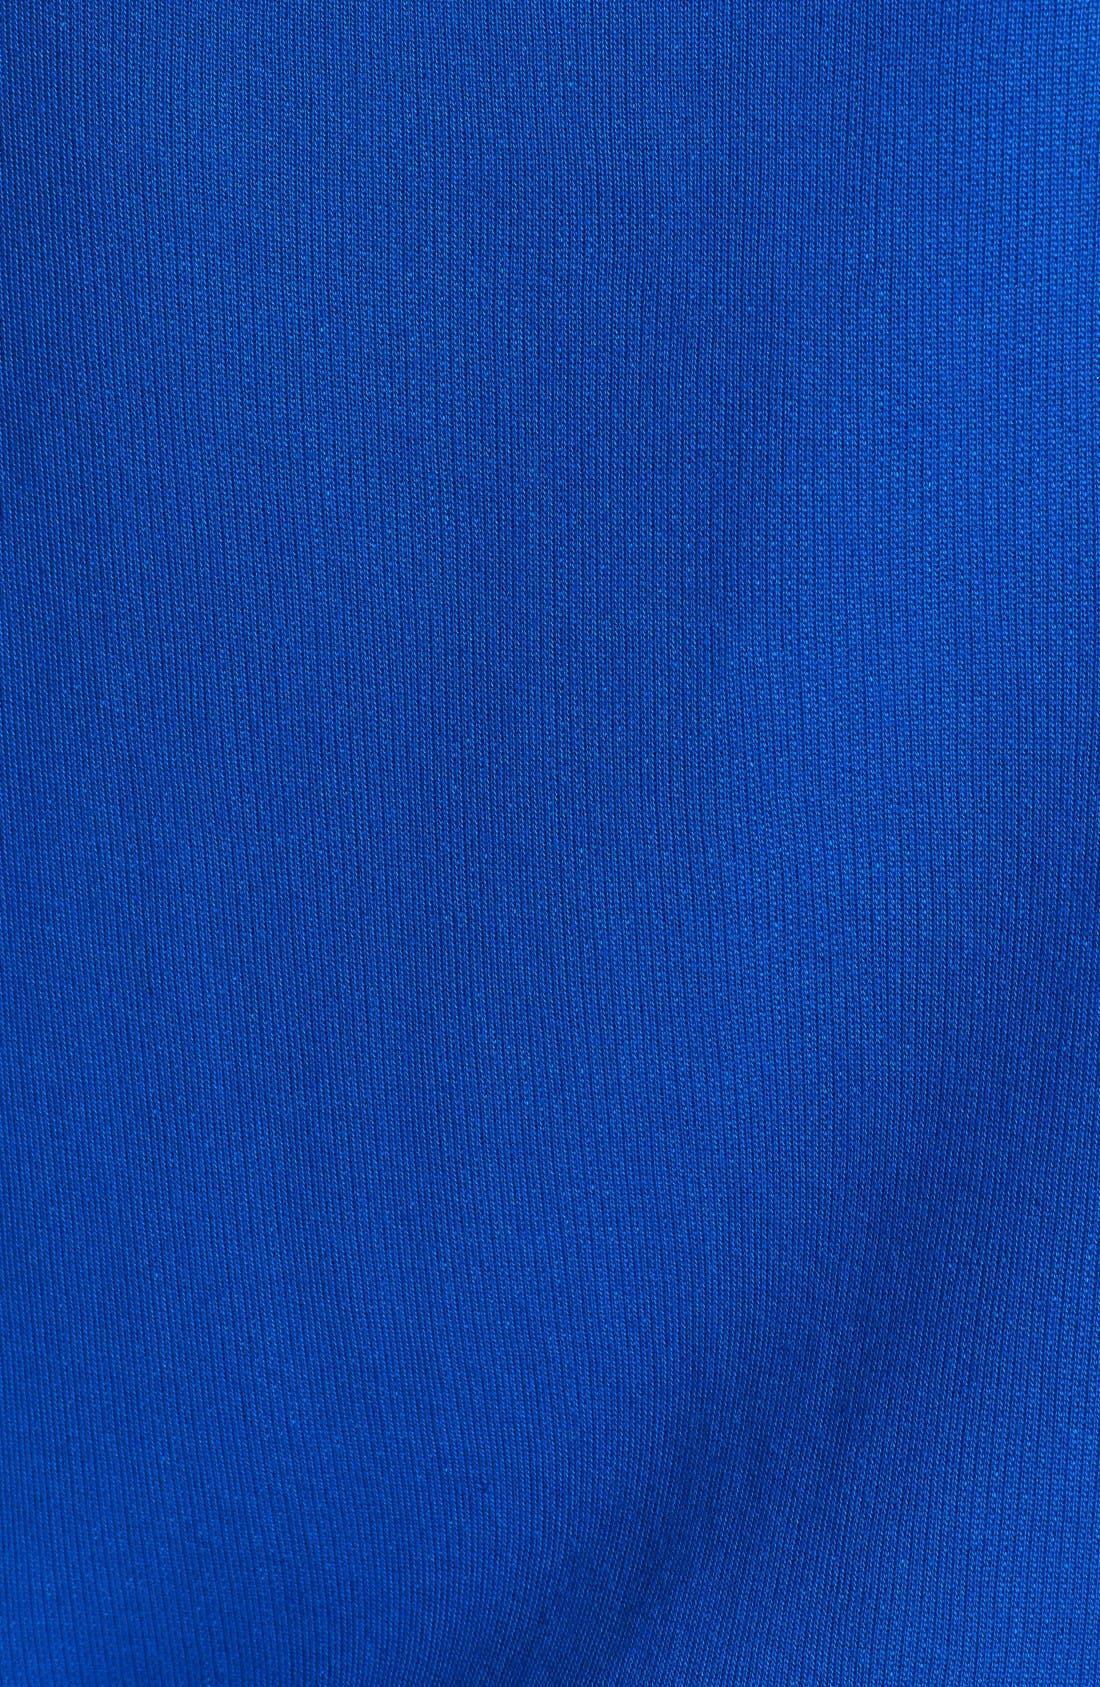 Alternate Image 4  - Hard Tail 'Frolic' Asymmetric Top